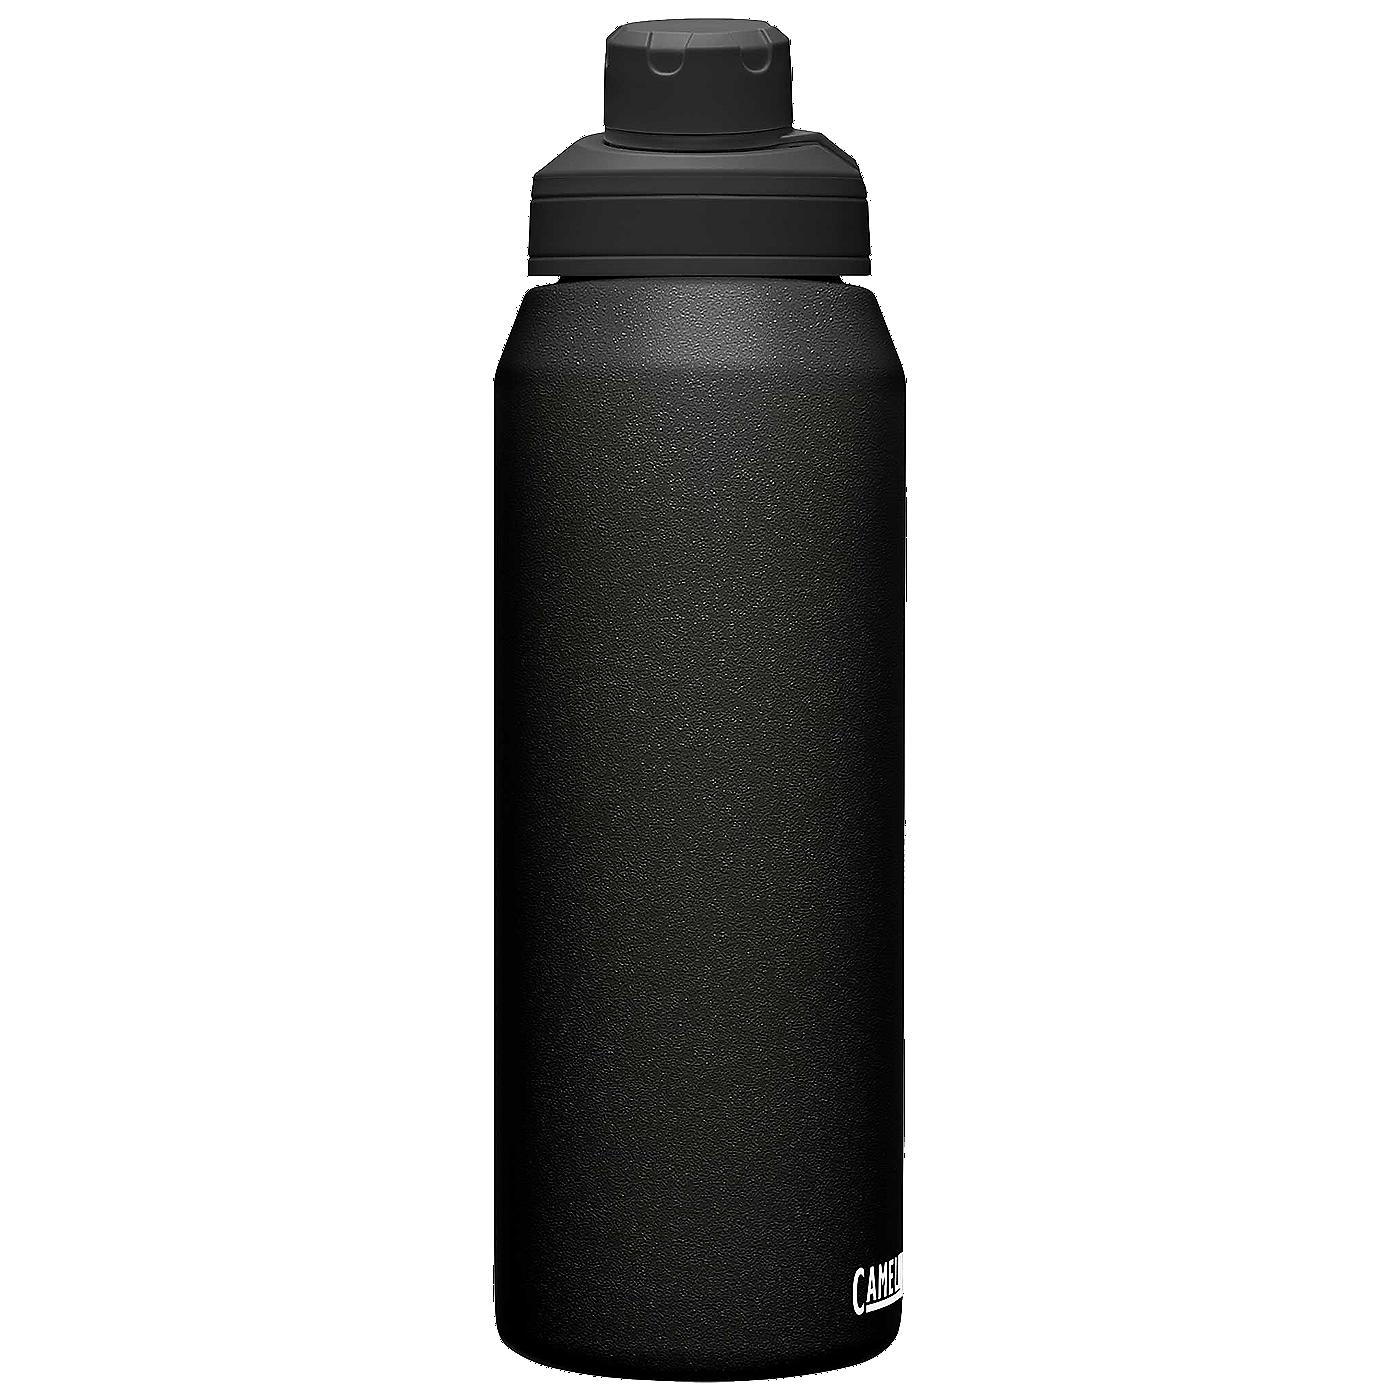 Camelbak Chute Mag 32 Oz. Vacuum Insulated Bottle